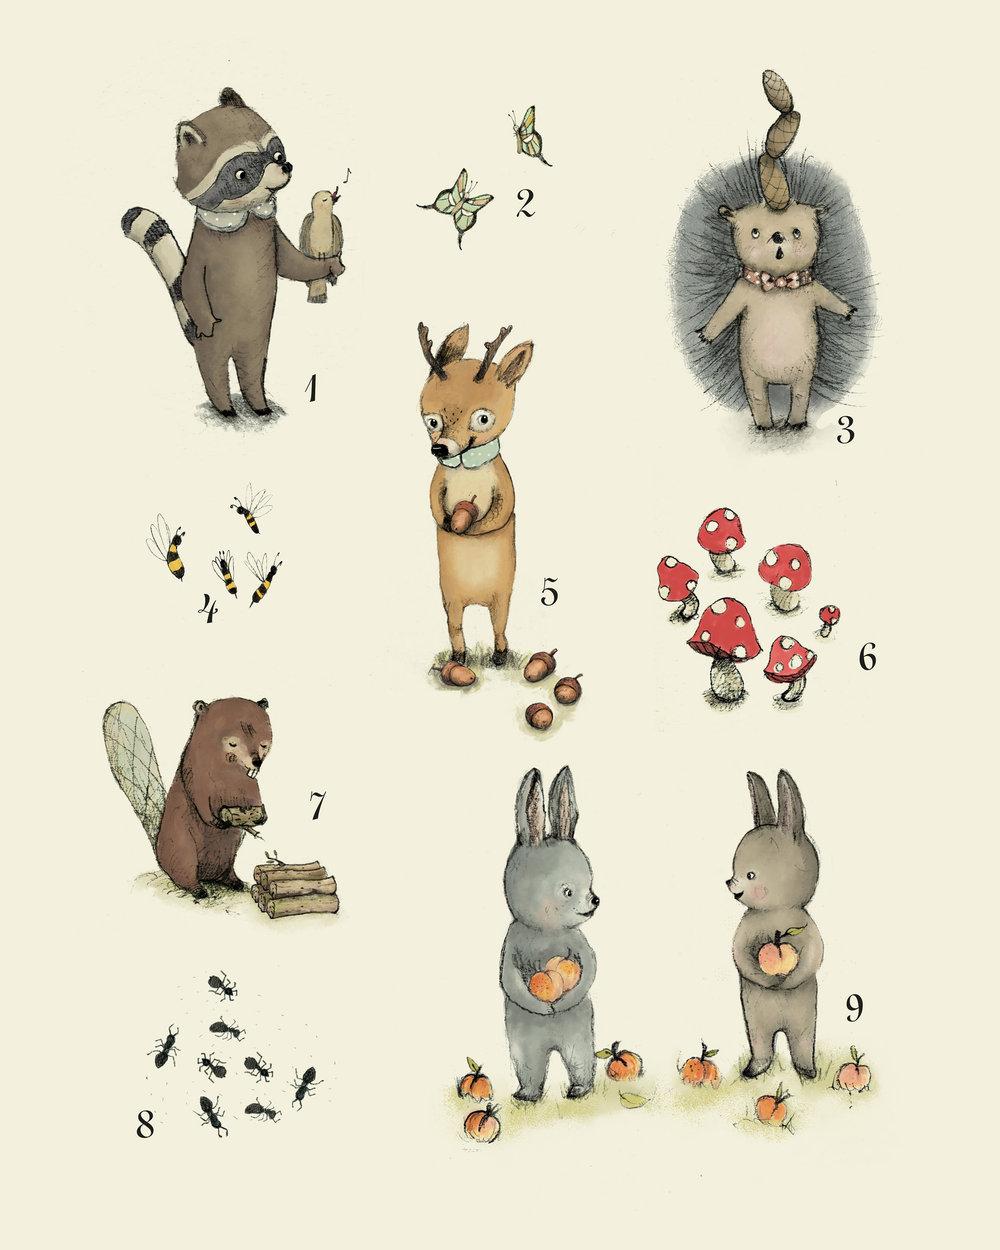 animalsnumbers.jpg